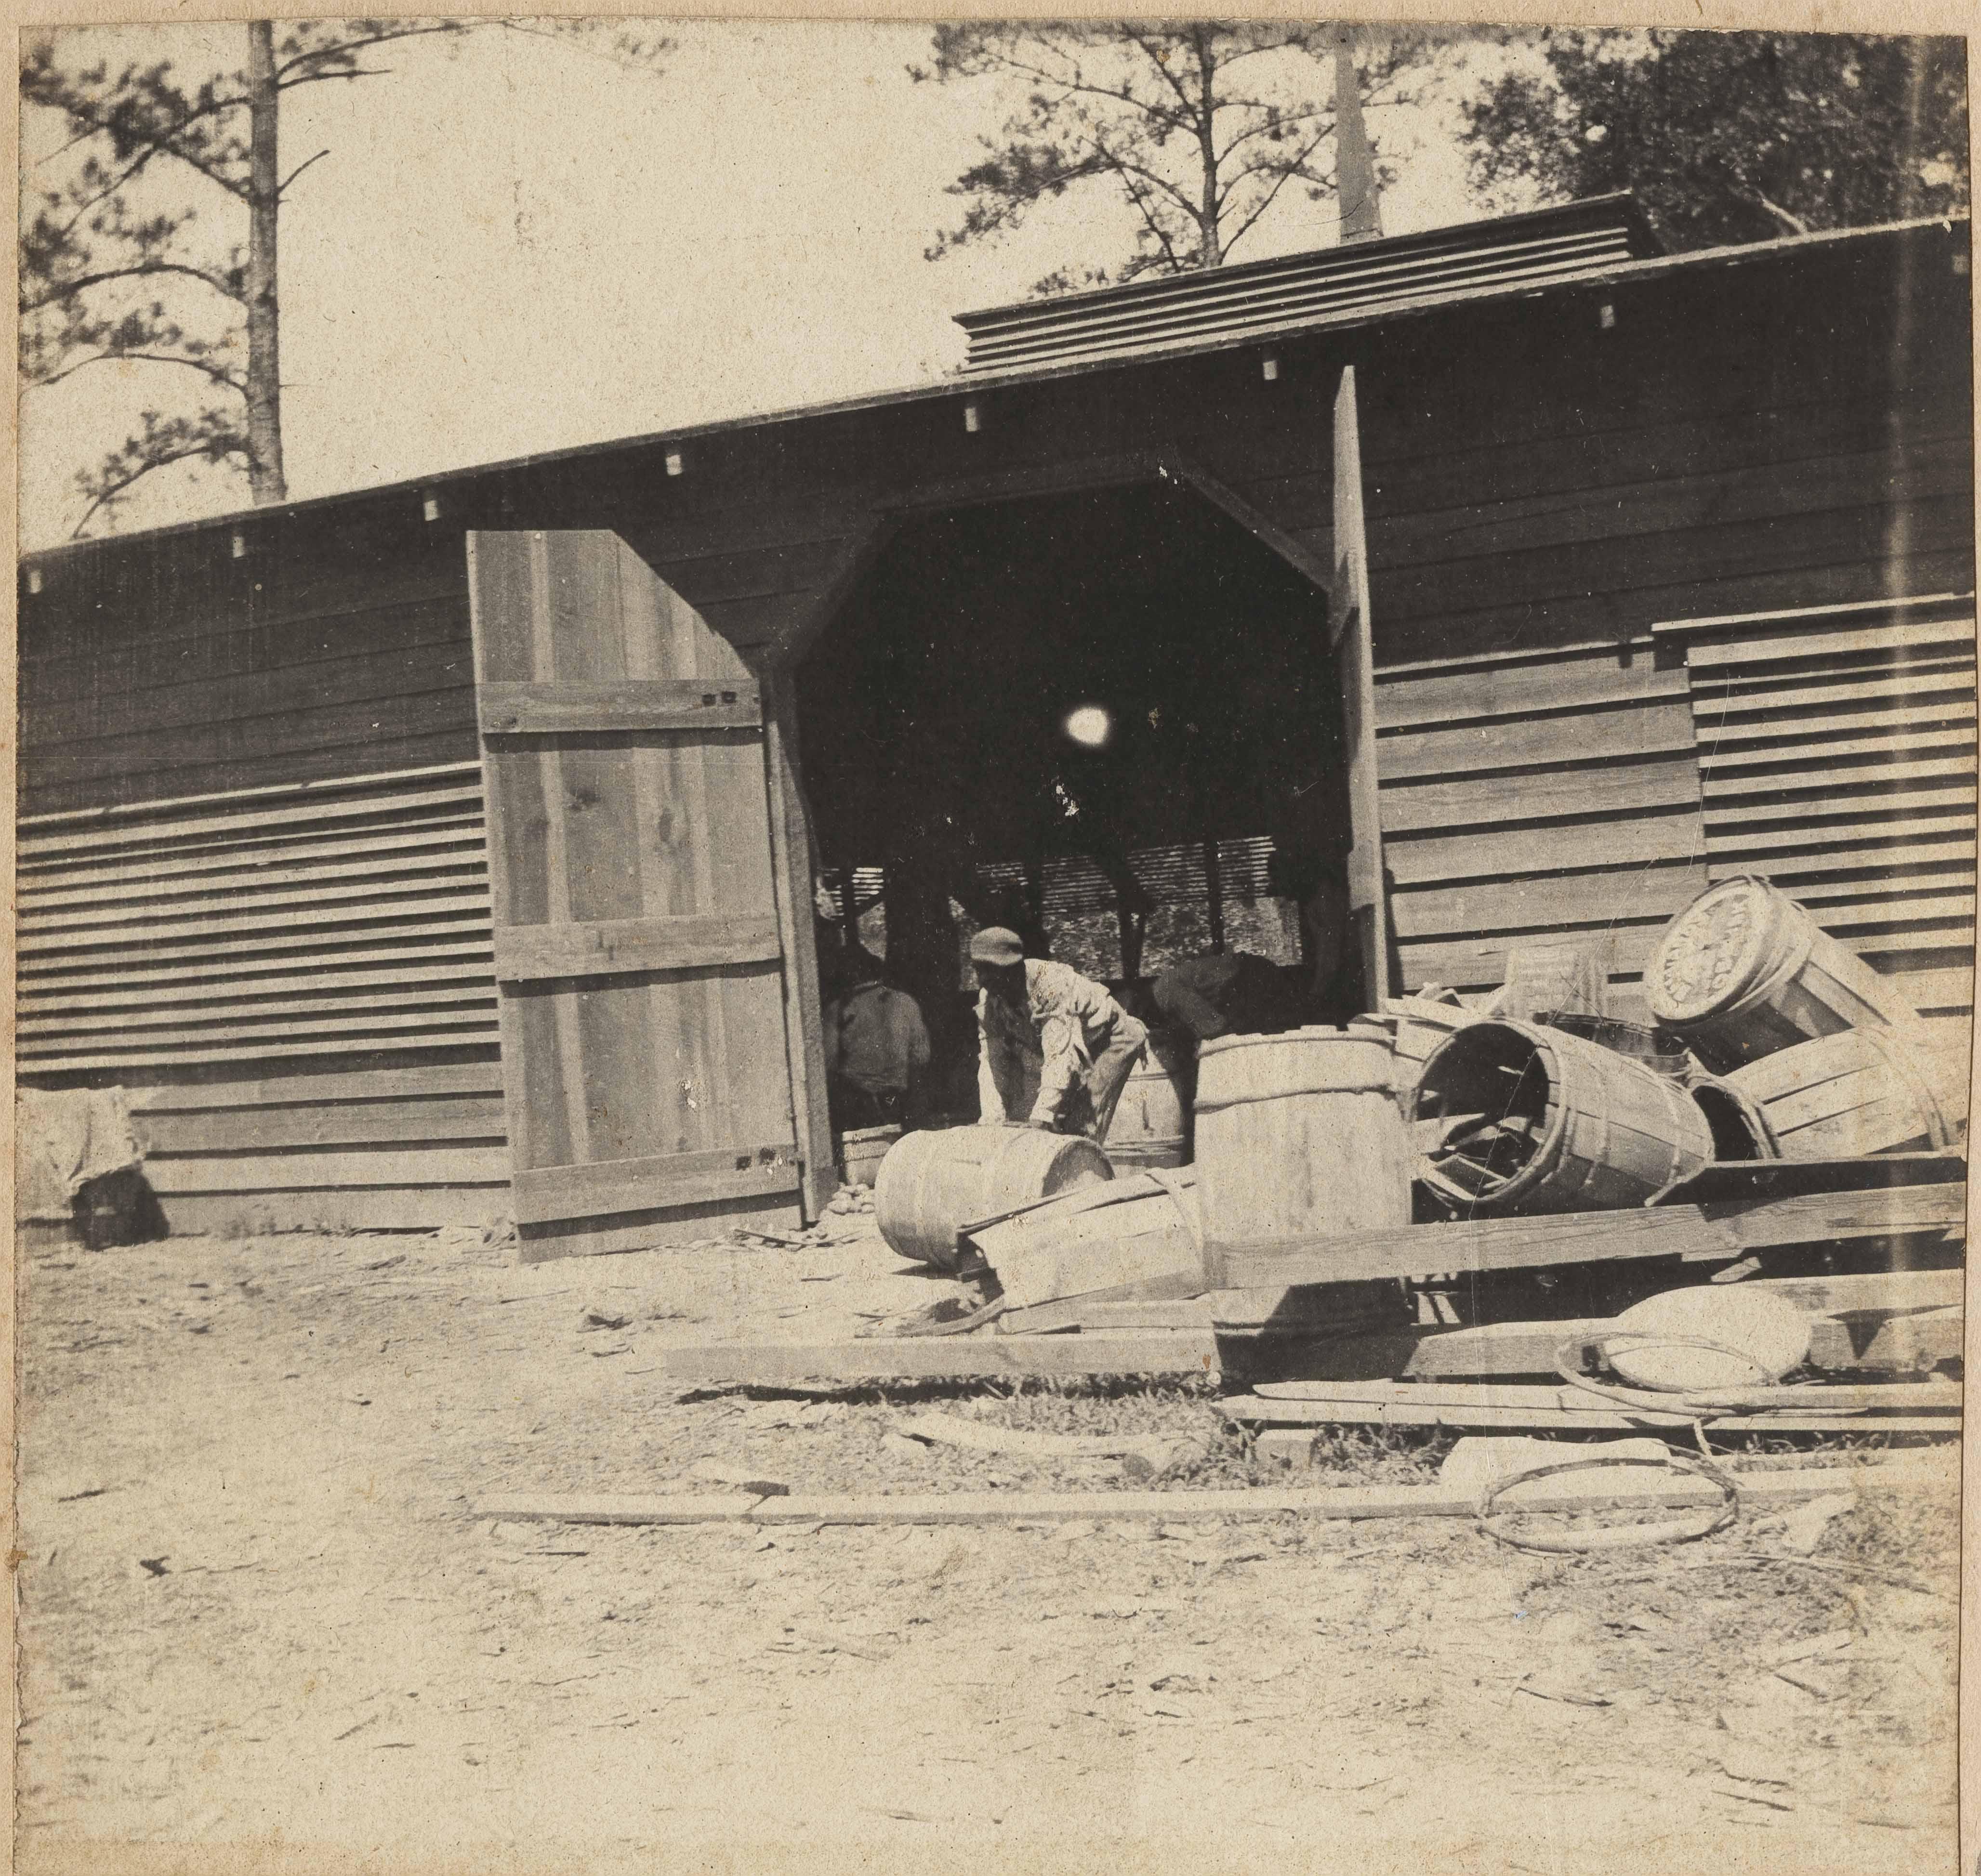 Man with damaged barrels